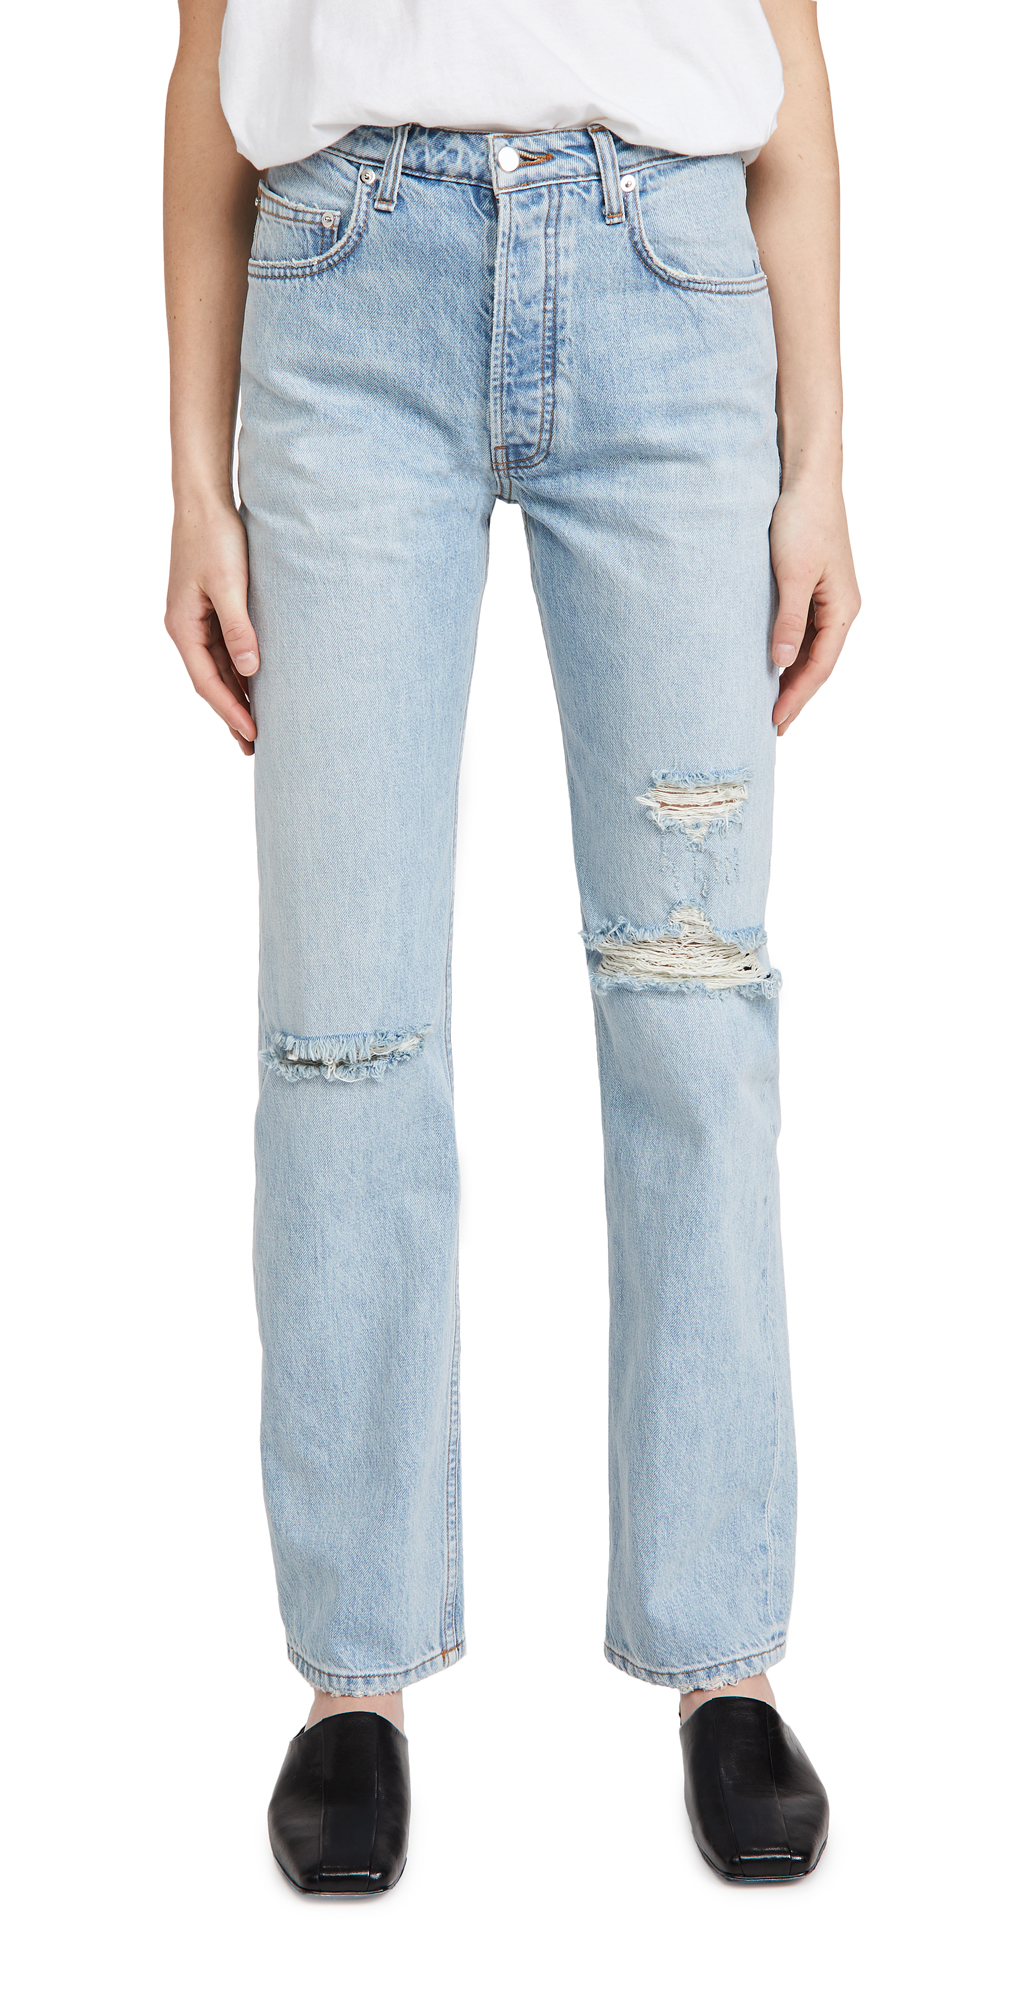 Sablyn Sammy Jeans